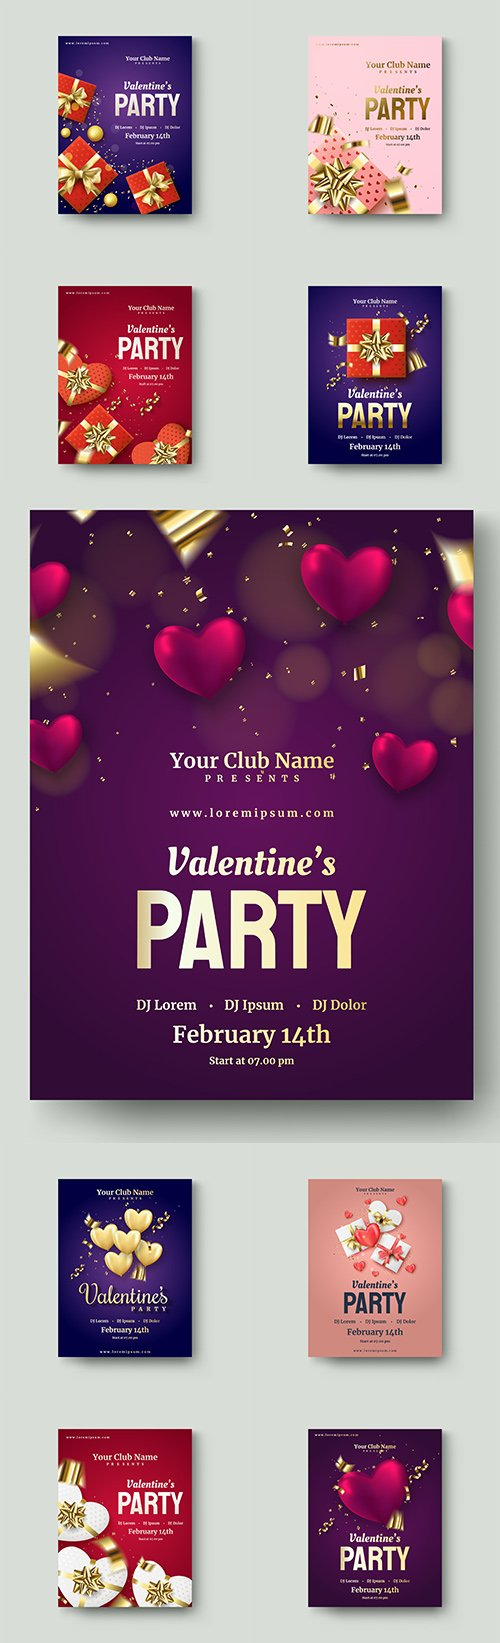 Valentine's Day romantic poster decorative illustrations